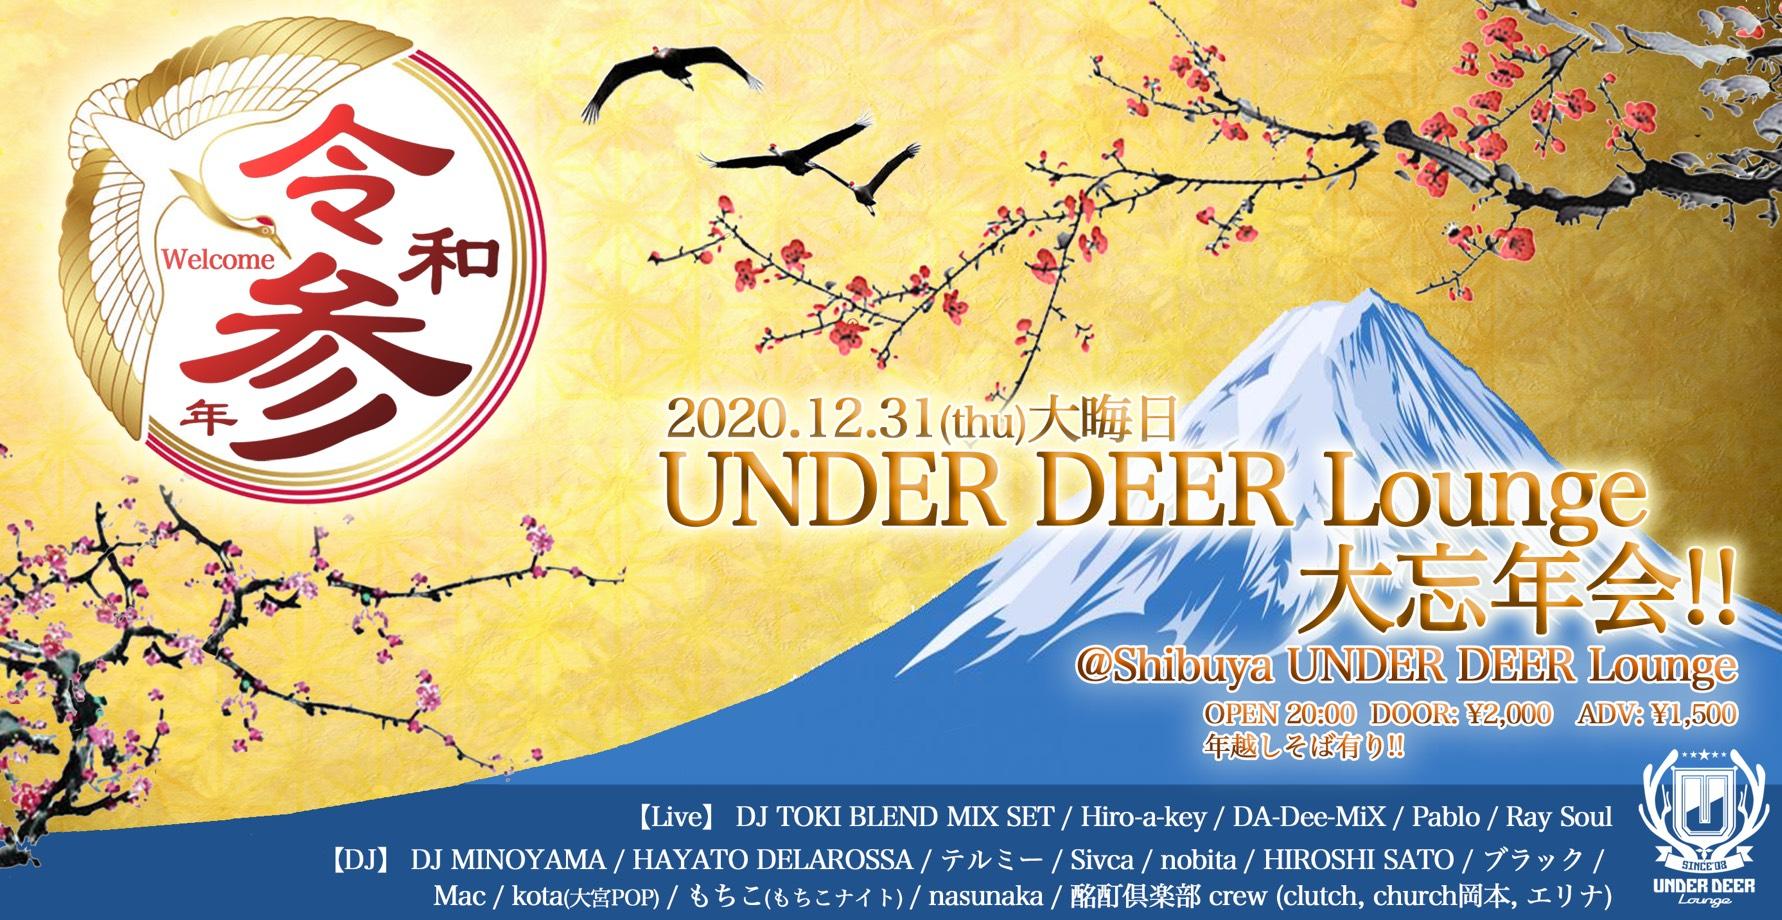 2020.12.31(thu) UNDER DEER Lounge 大忘年会!! @渋谷UNDER DEER Lounge